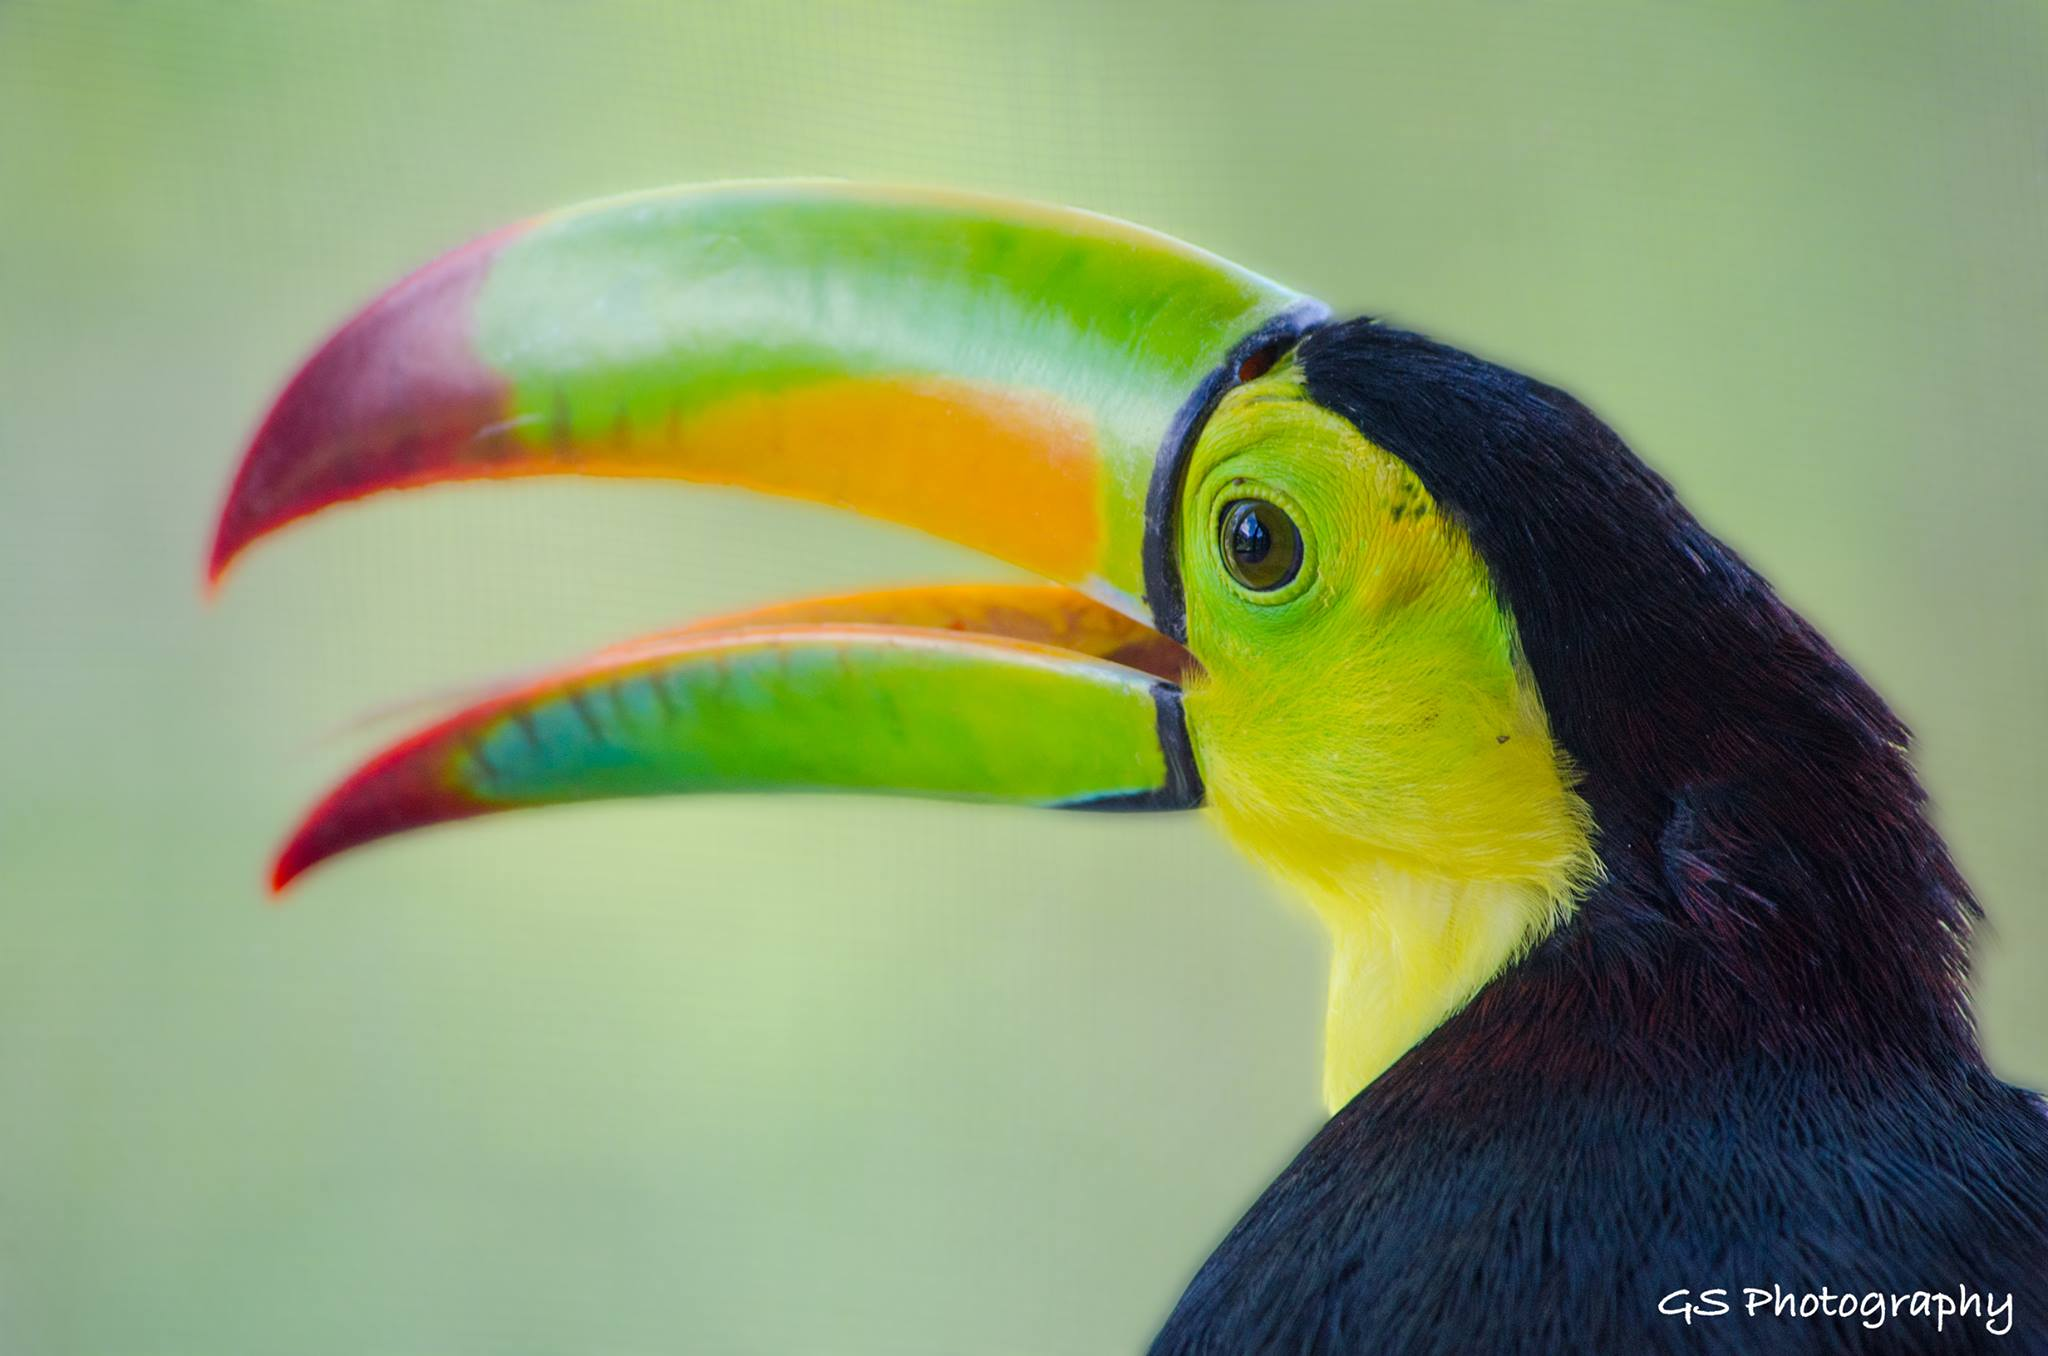 Belize's National Bird – The Keel- Billed Toucan